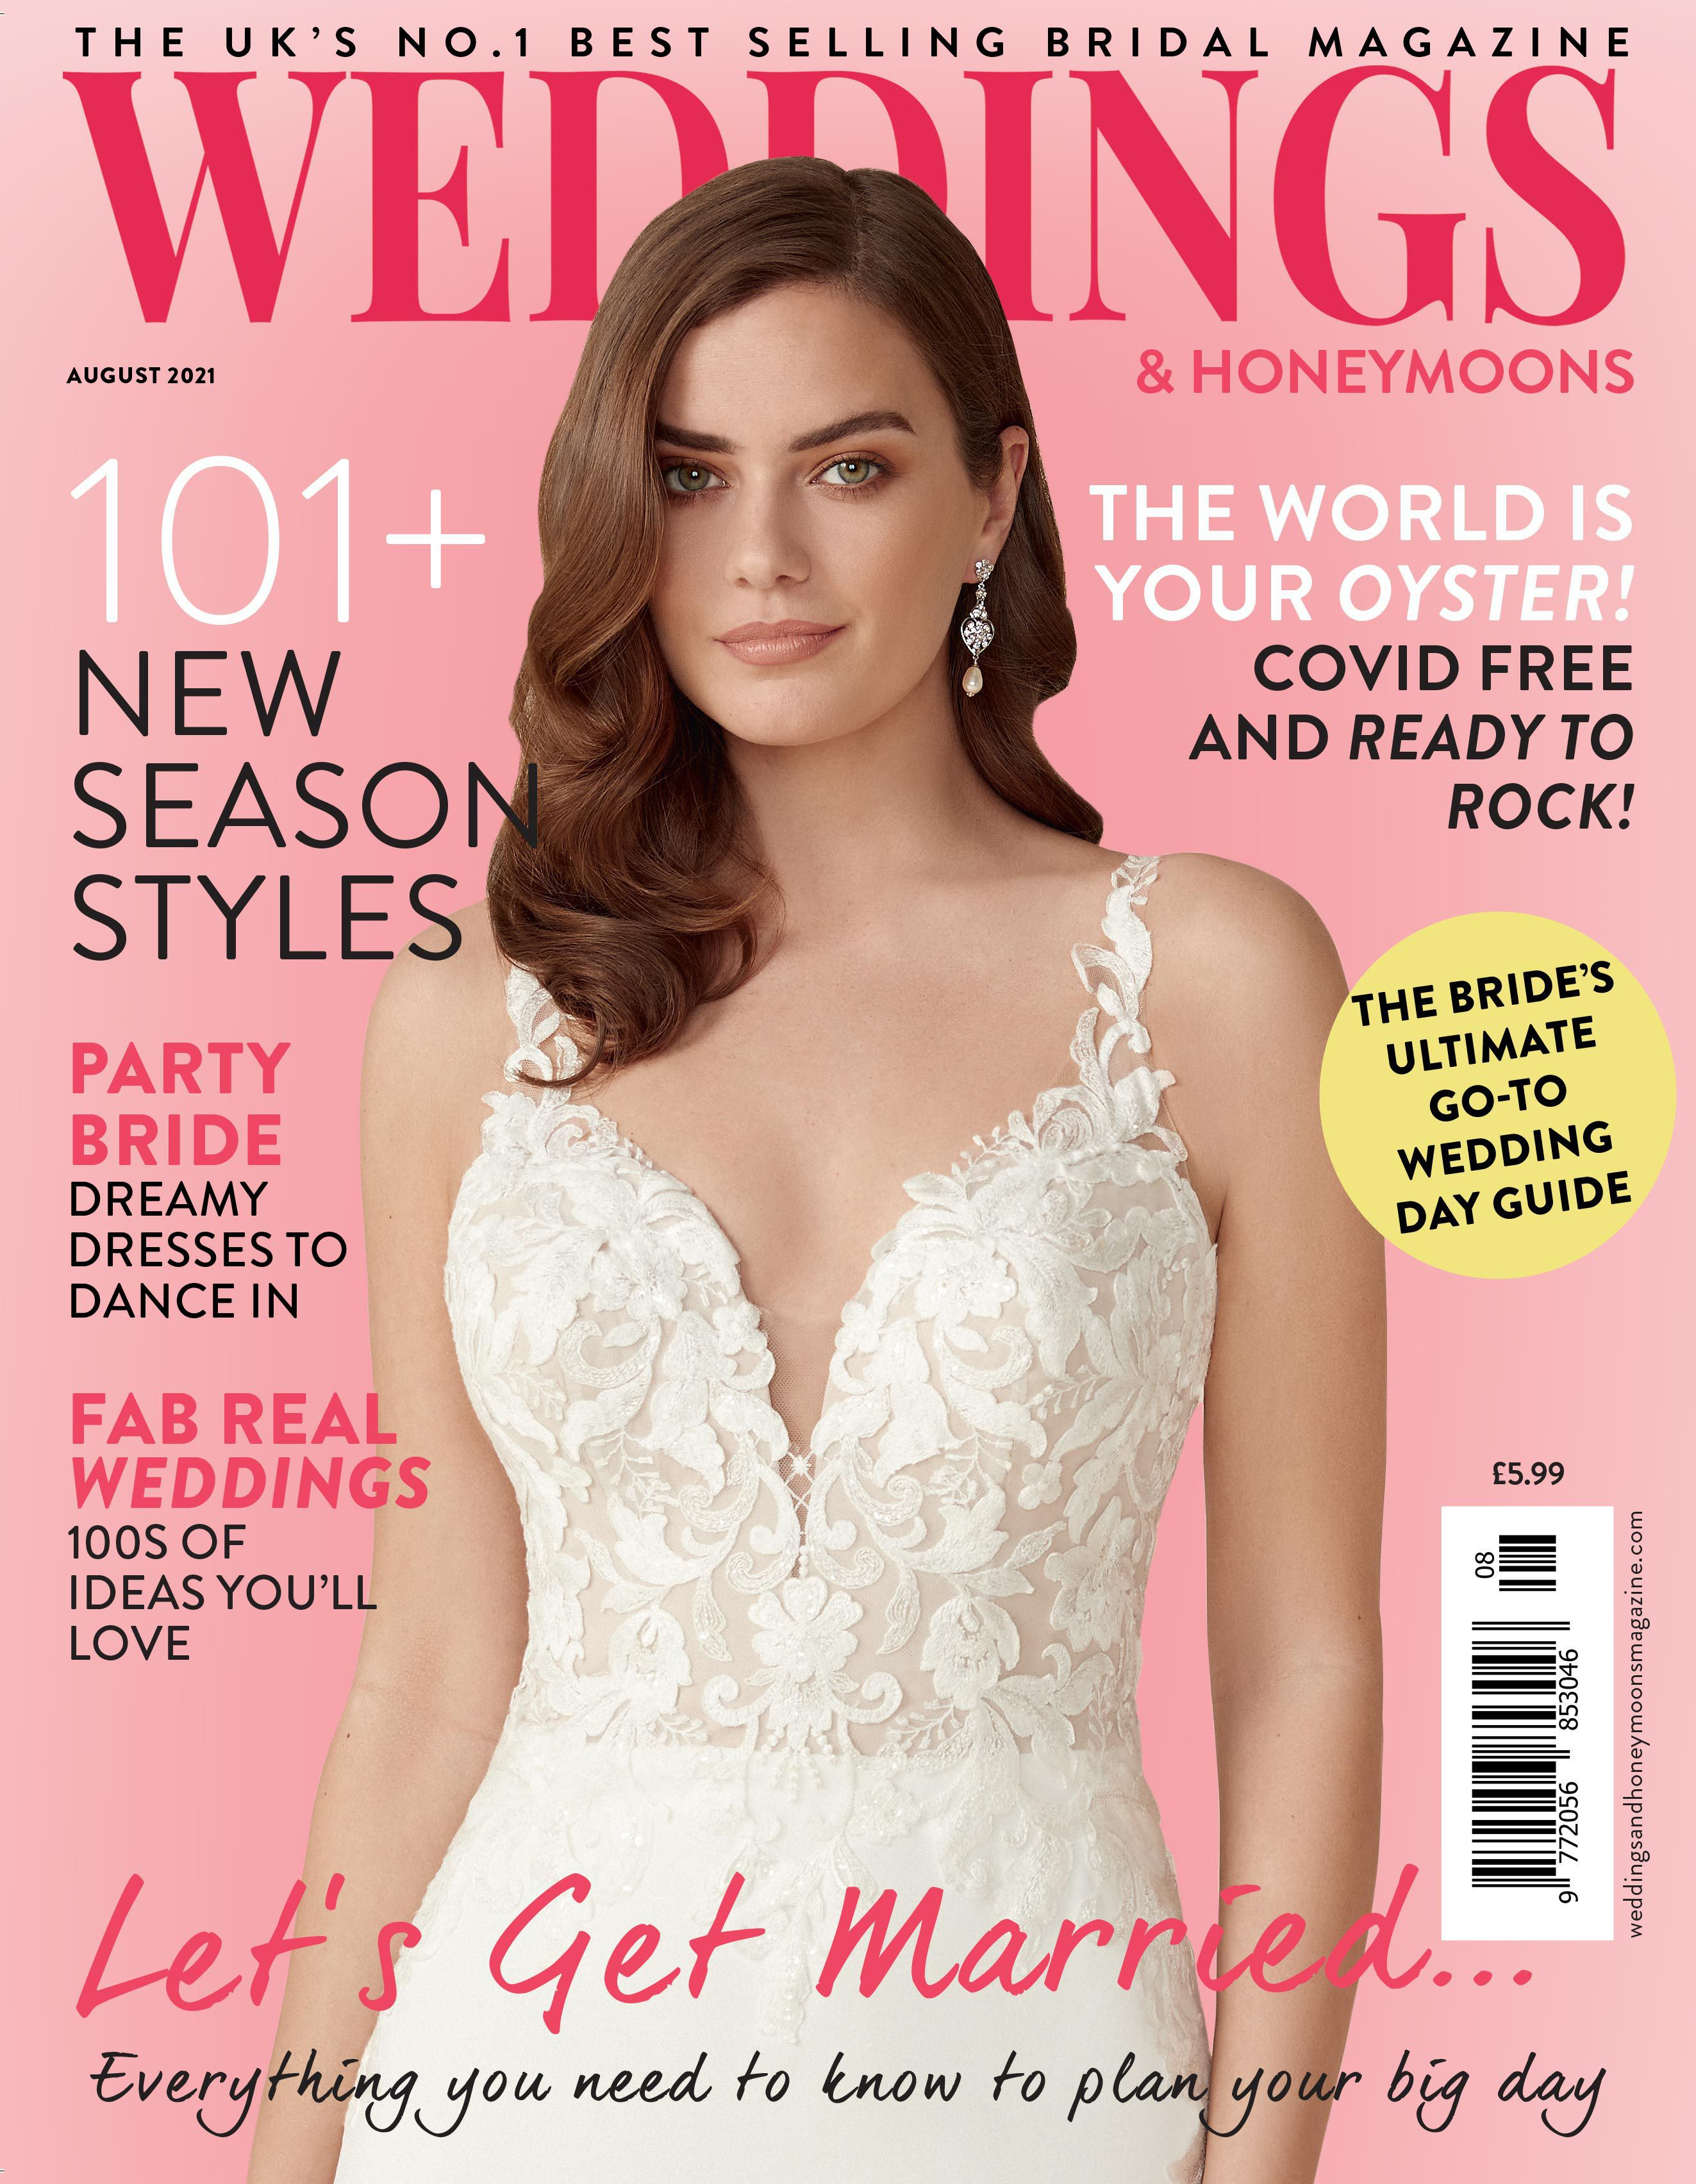 Weddings and Honeymoons_August 2021_Justin Alexander_Alivia_88153